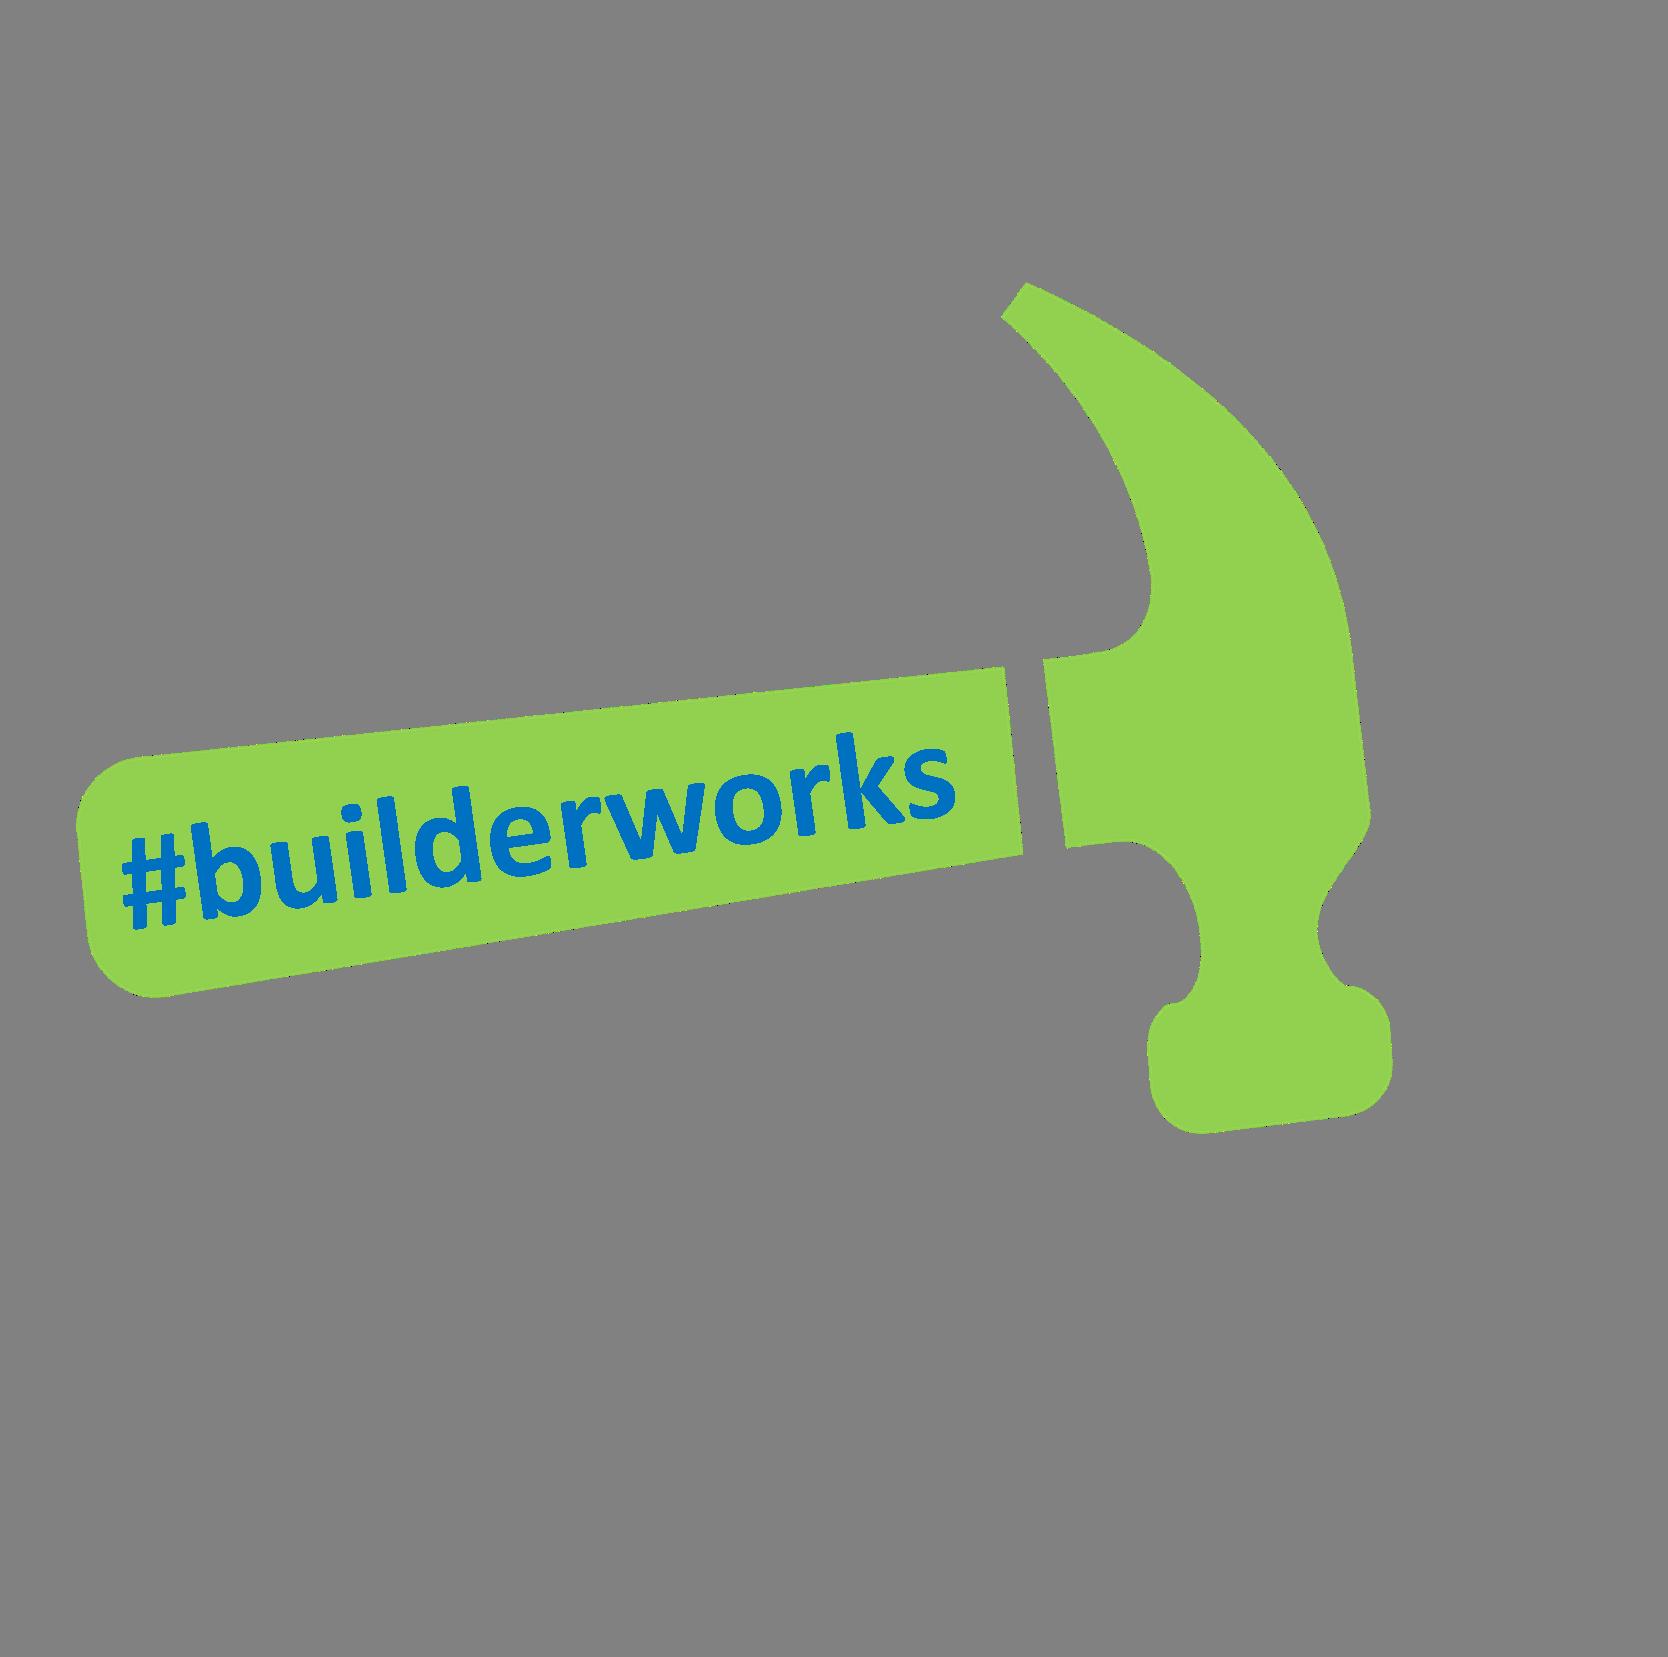 #builderworks